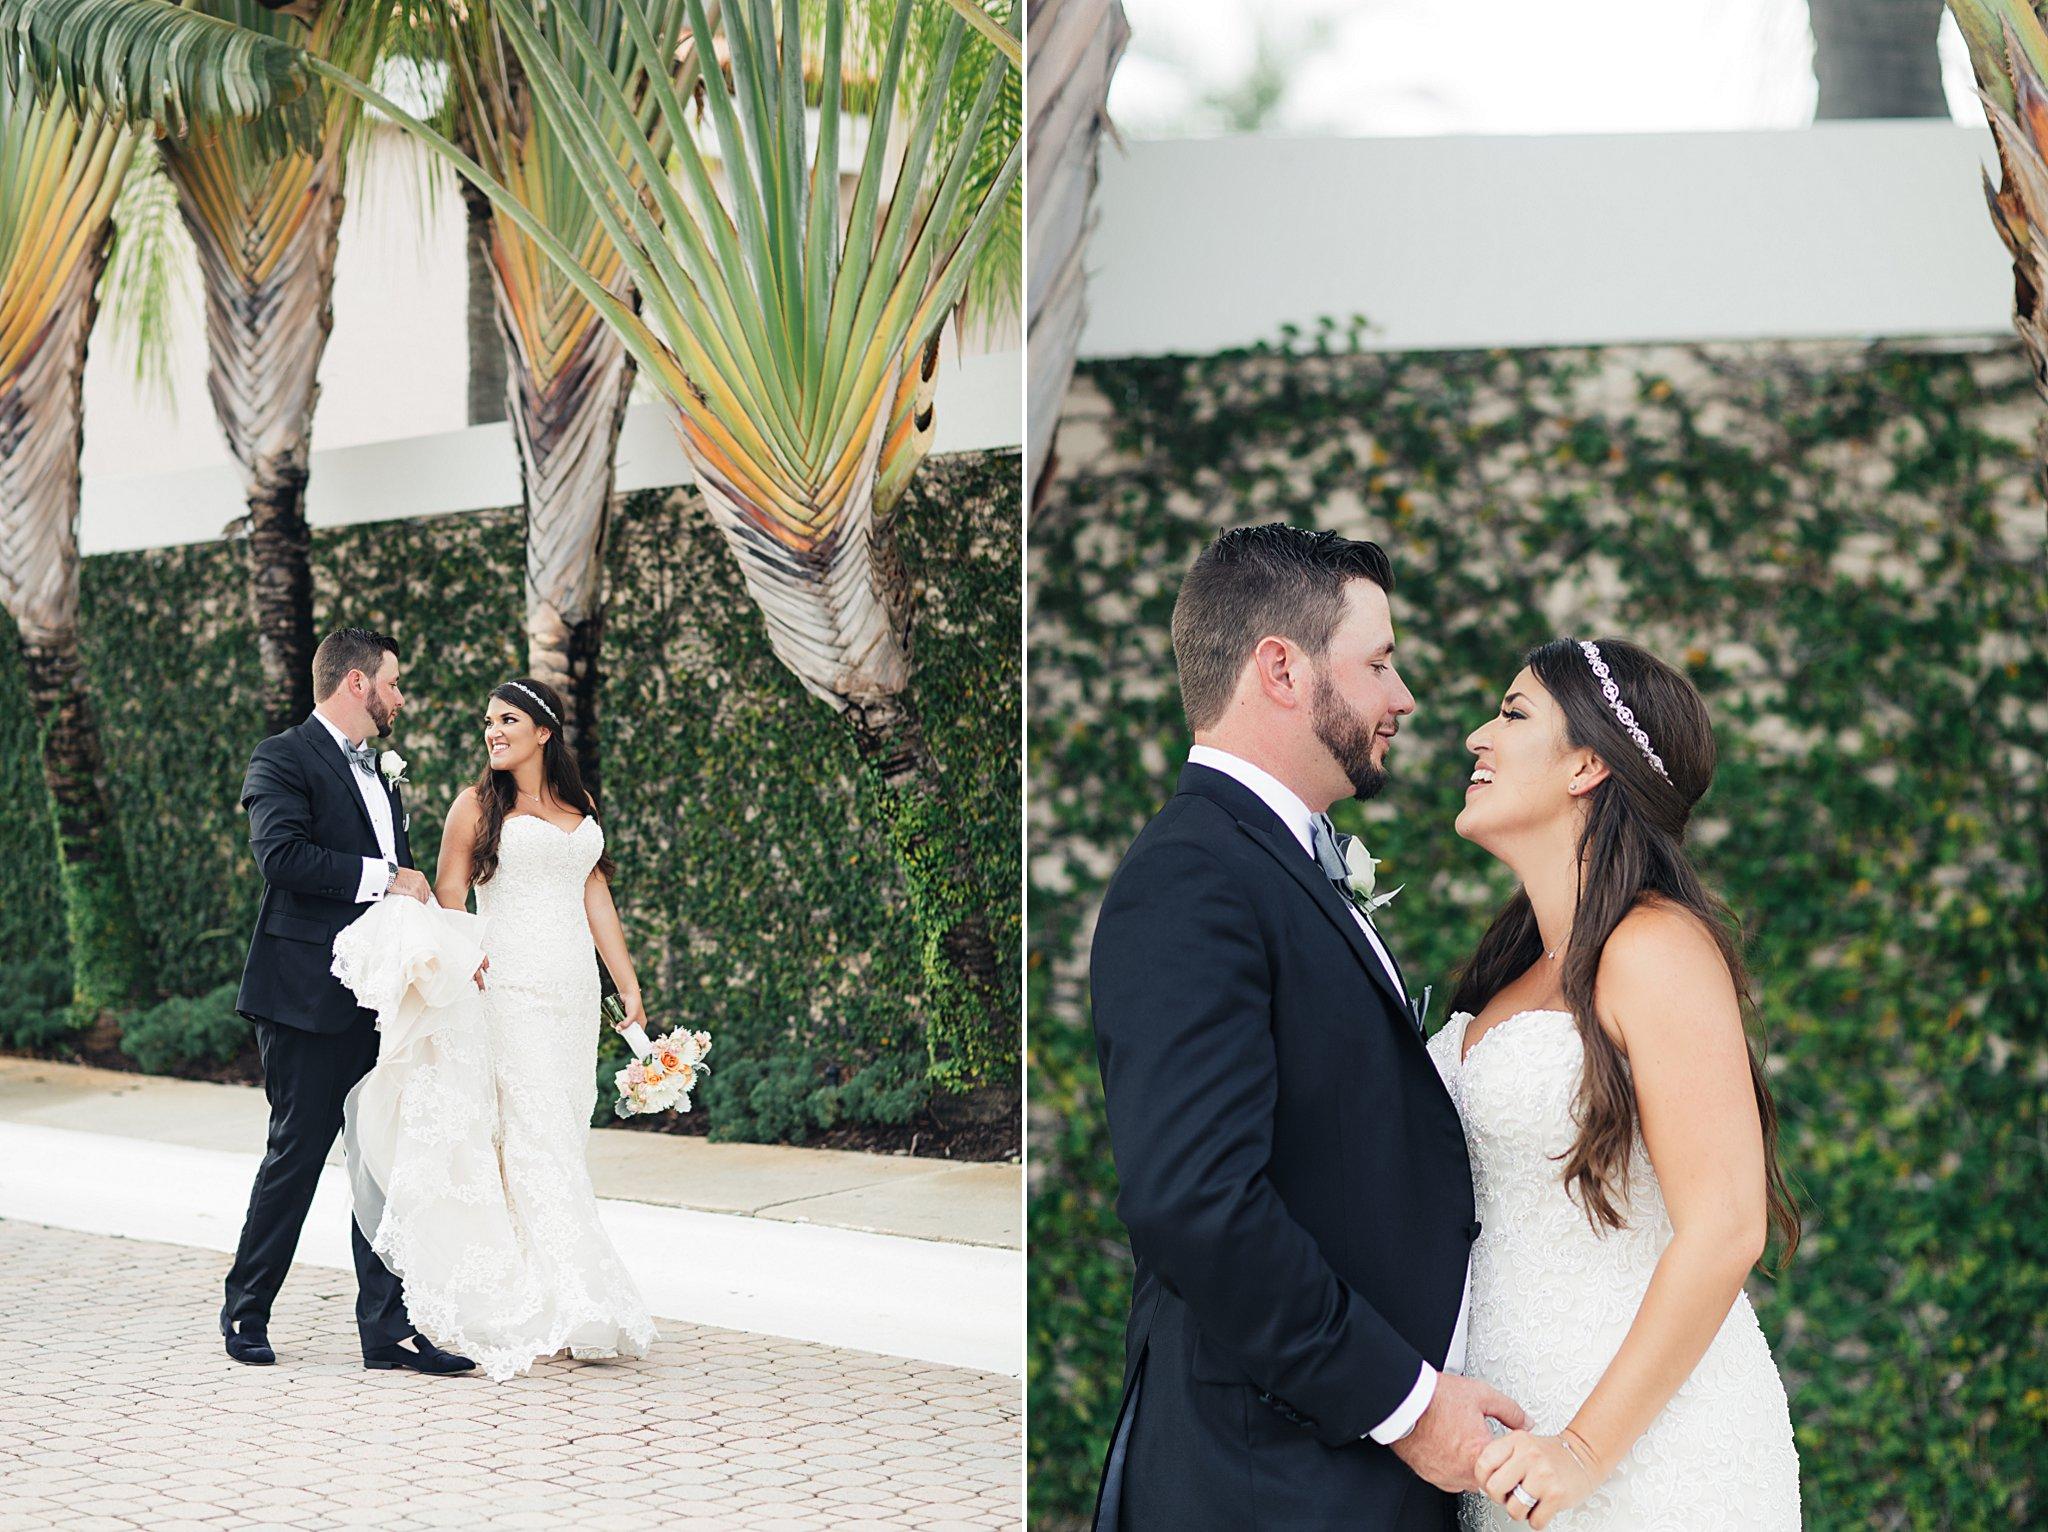 WeddingandEngagementFloridaPhotographer_2808.jpg